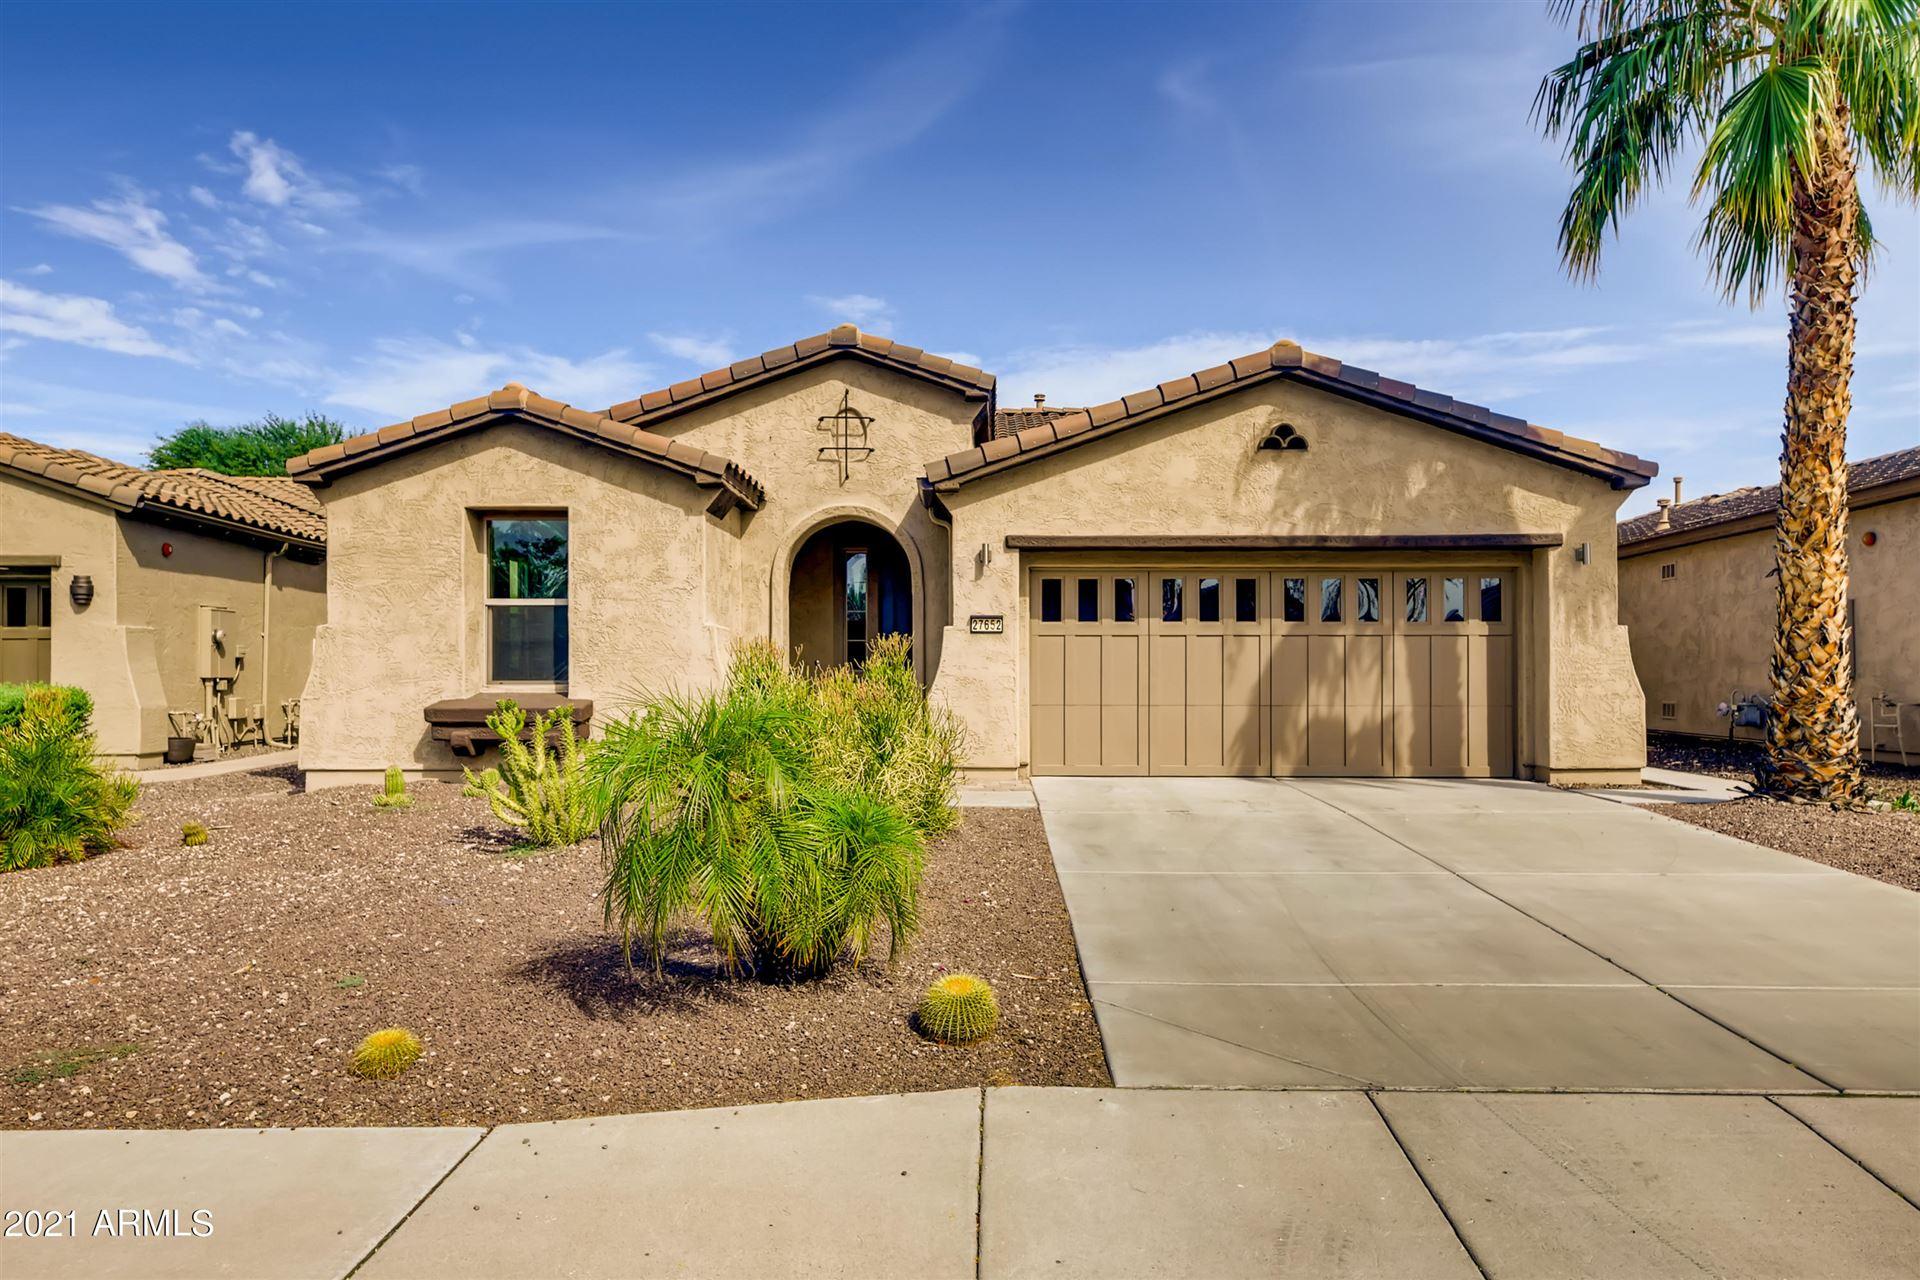 27652 N MAKENA Place, Peoria, AZ 85383 - MLS#: 6267093